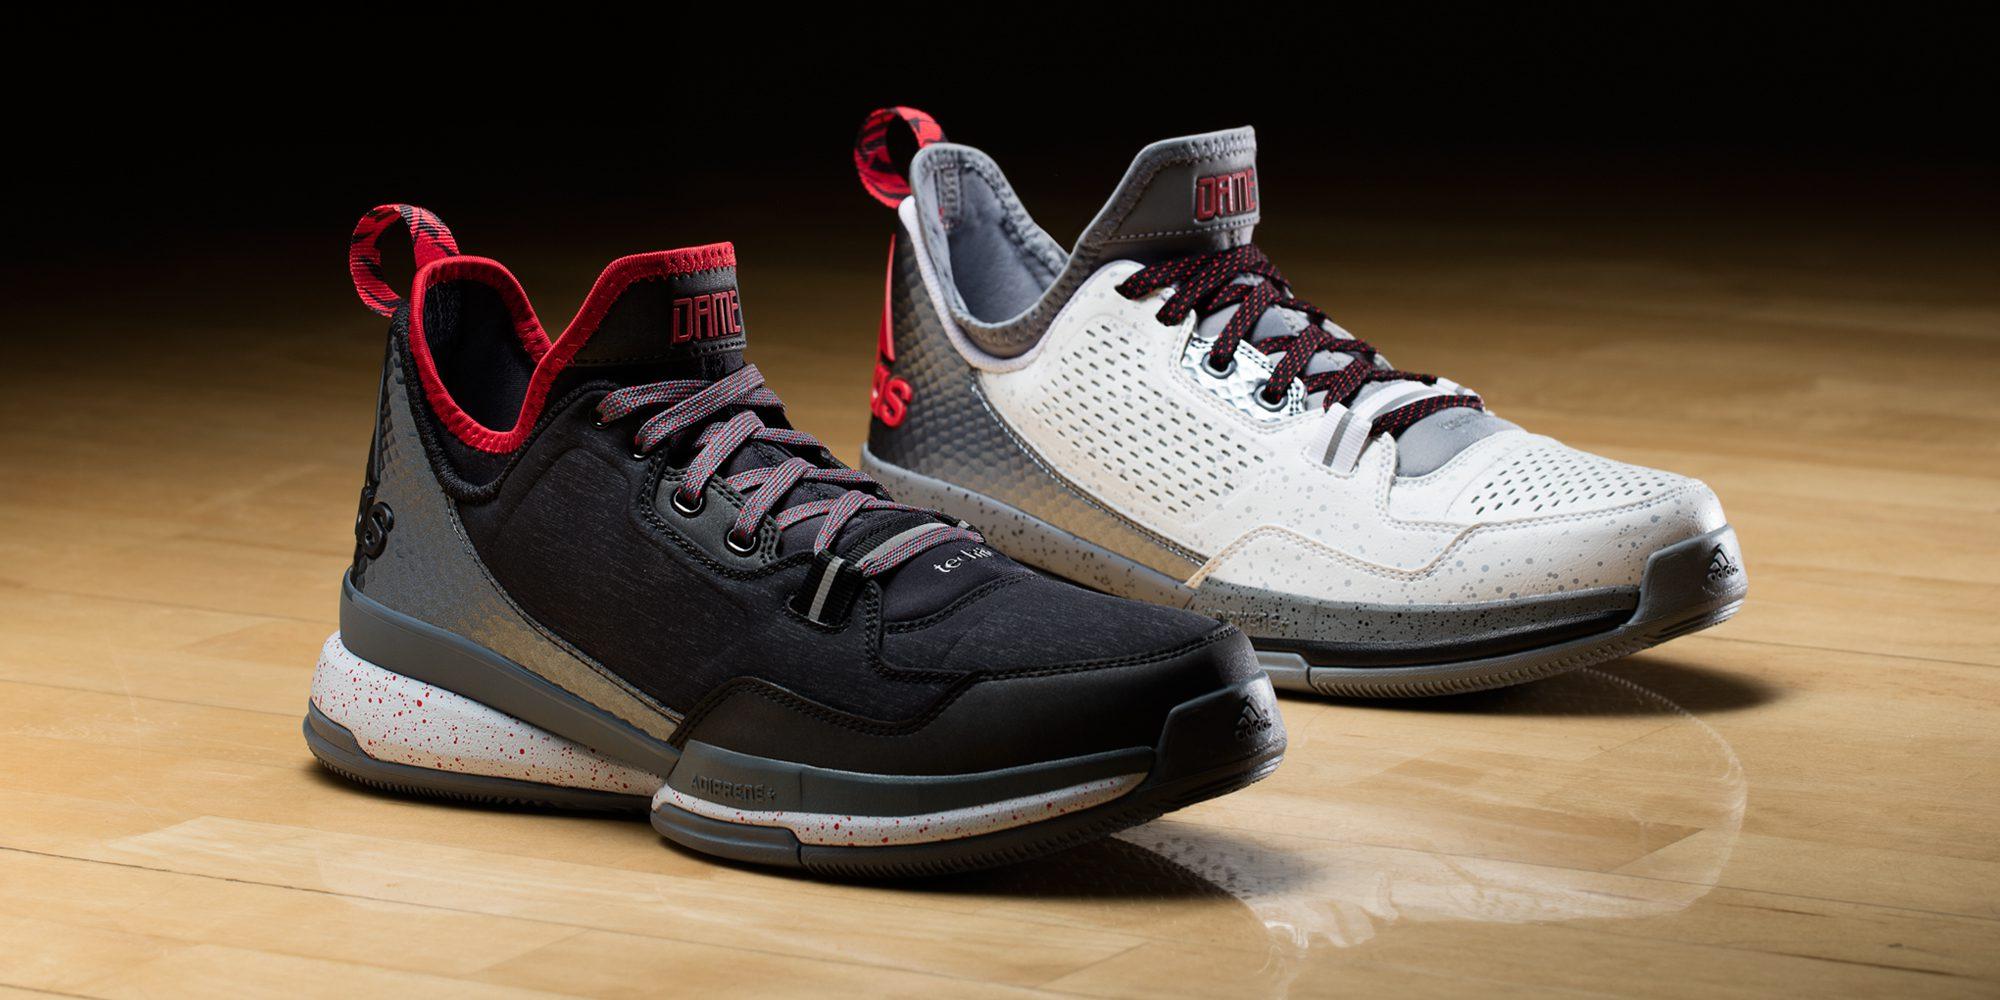 adidas damian lillard shoes 2015